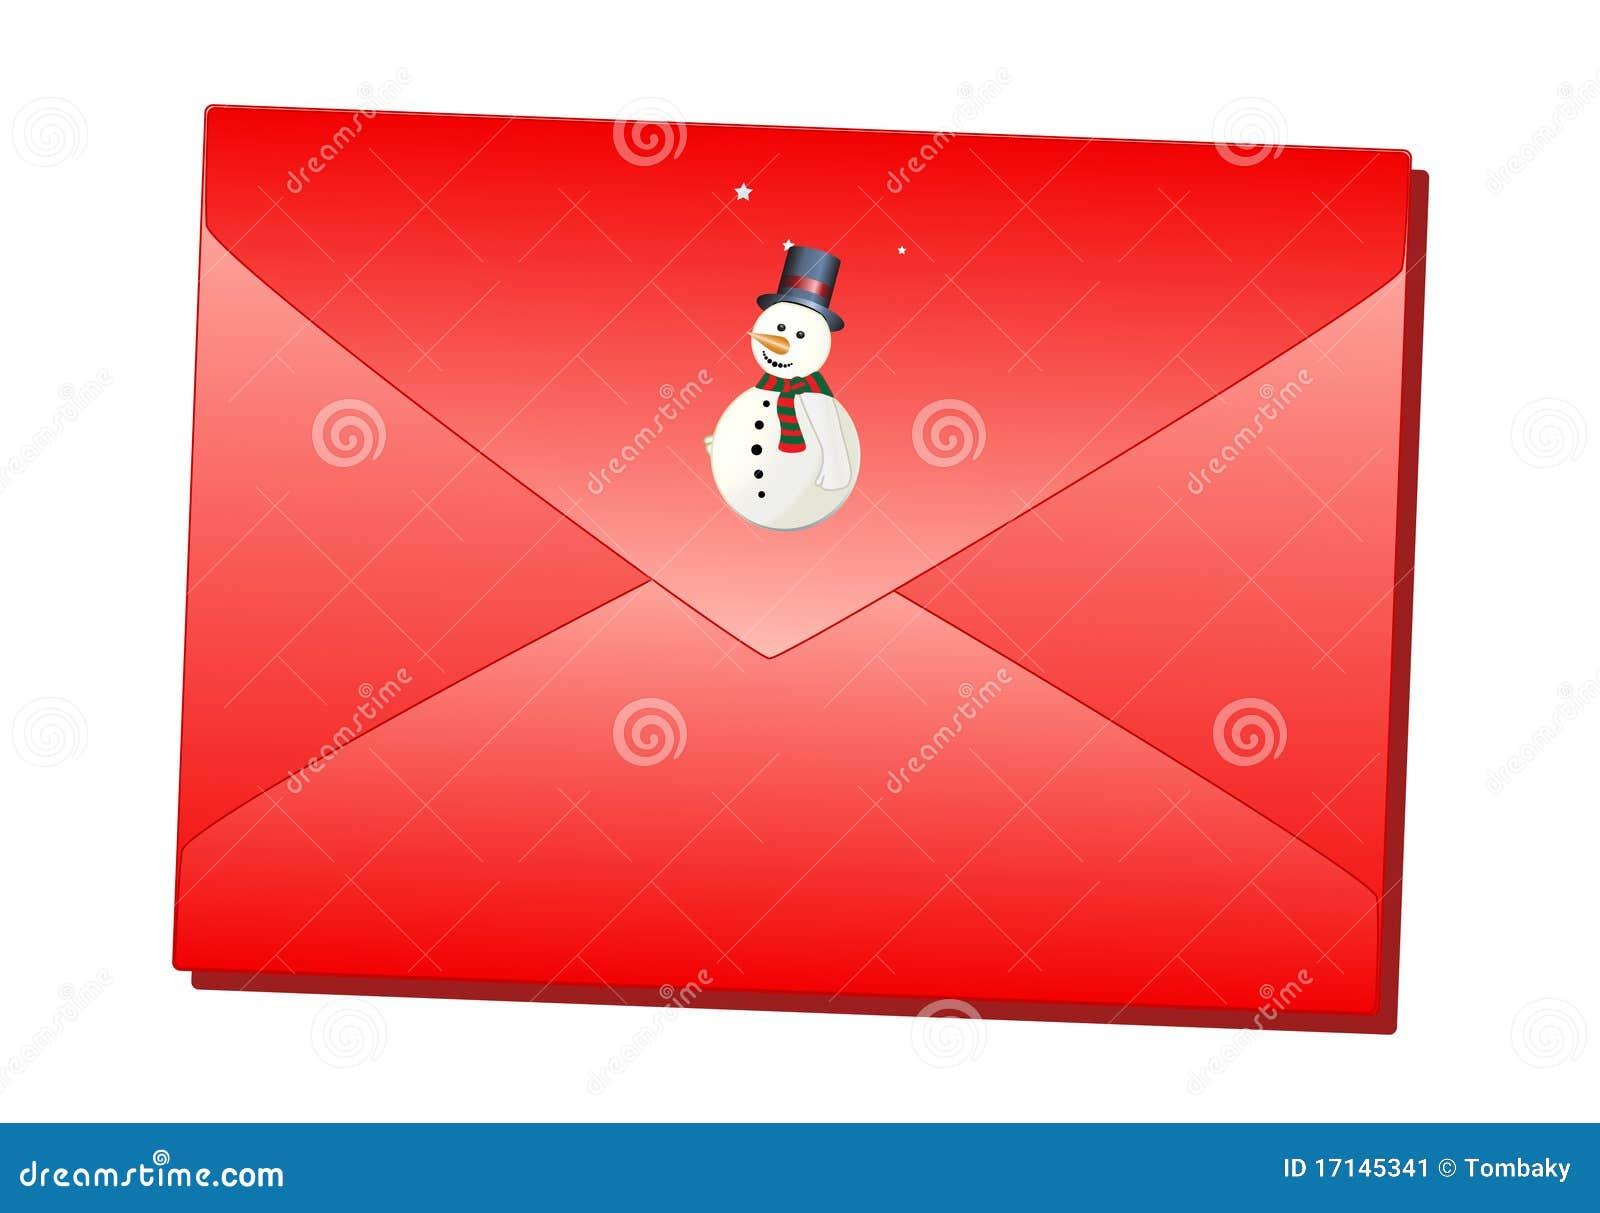 Red Christmas envelope